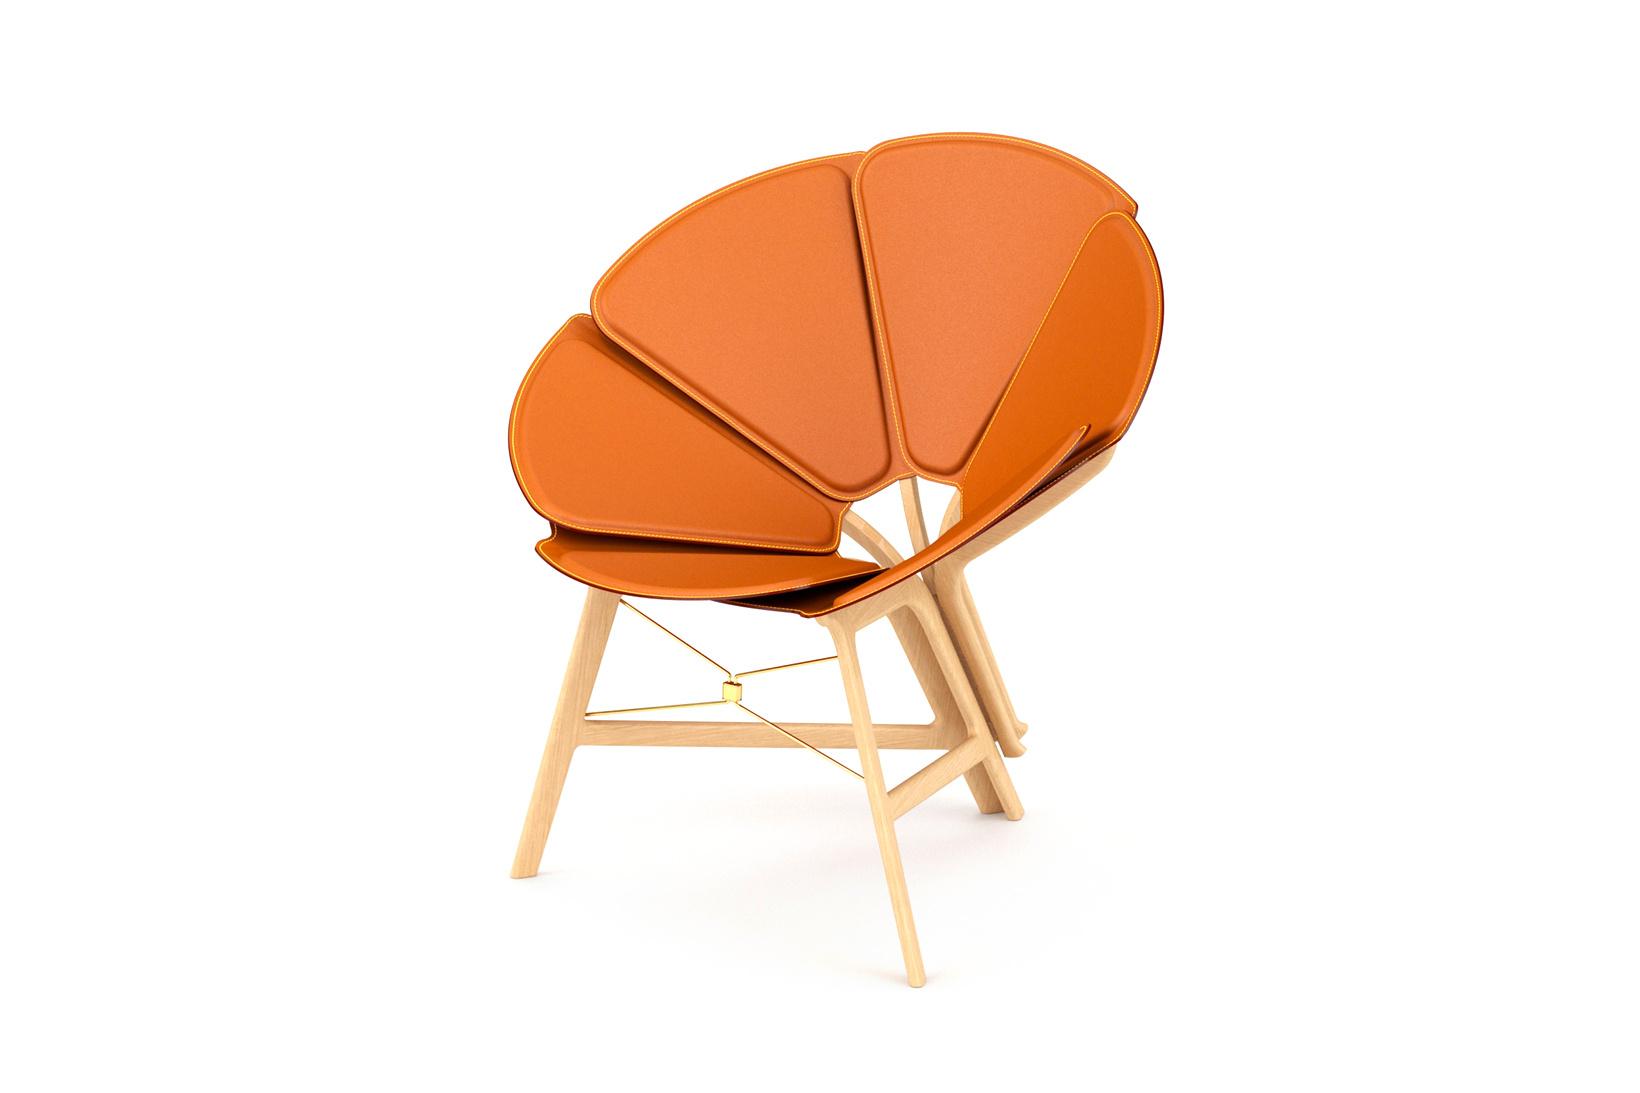 louis-vuitton-furniture-collection-2